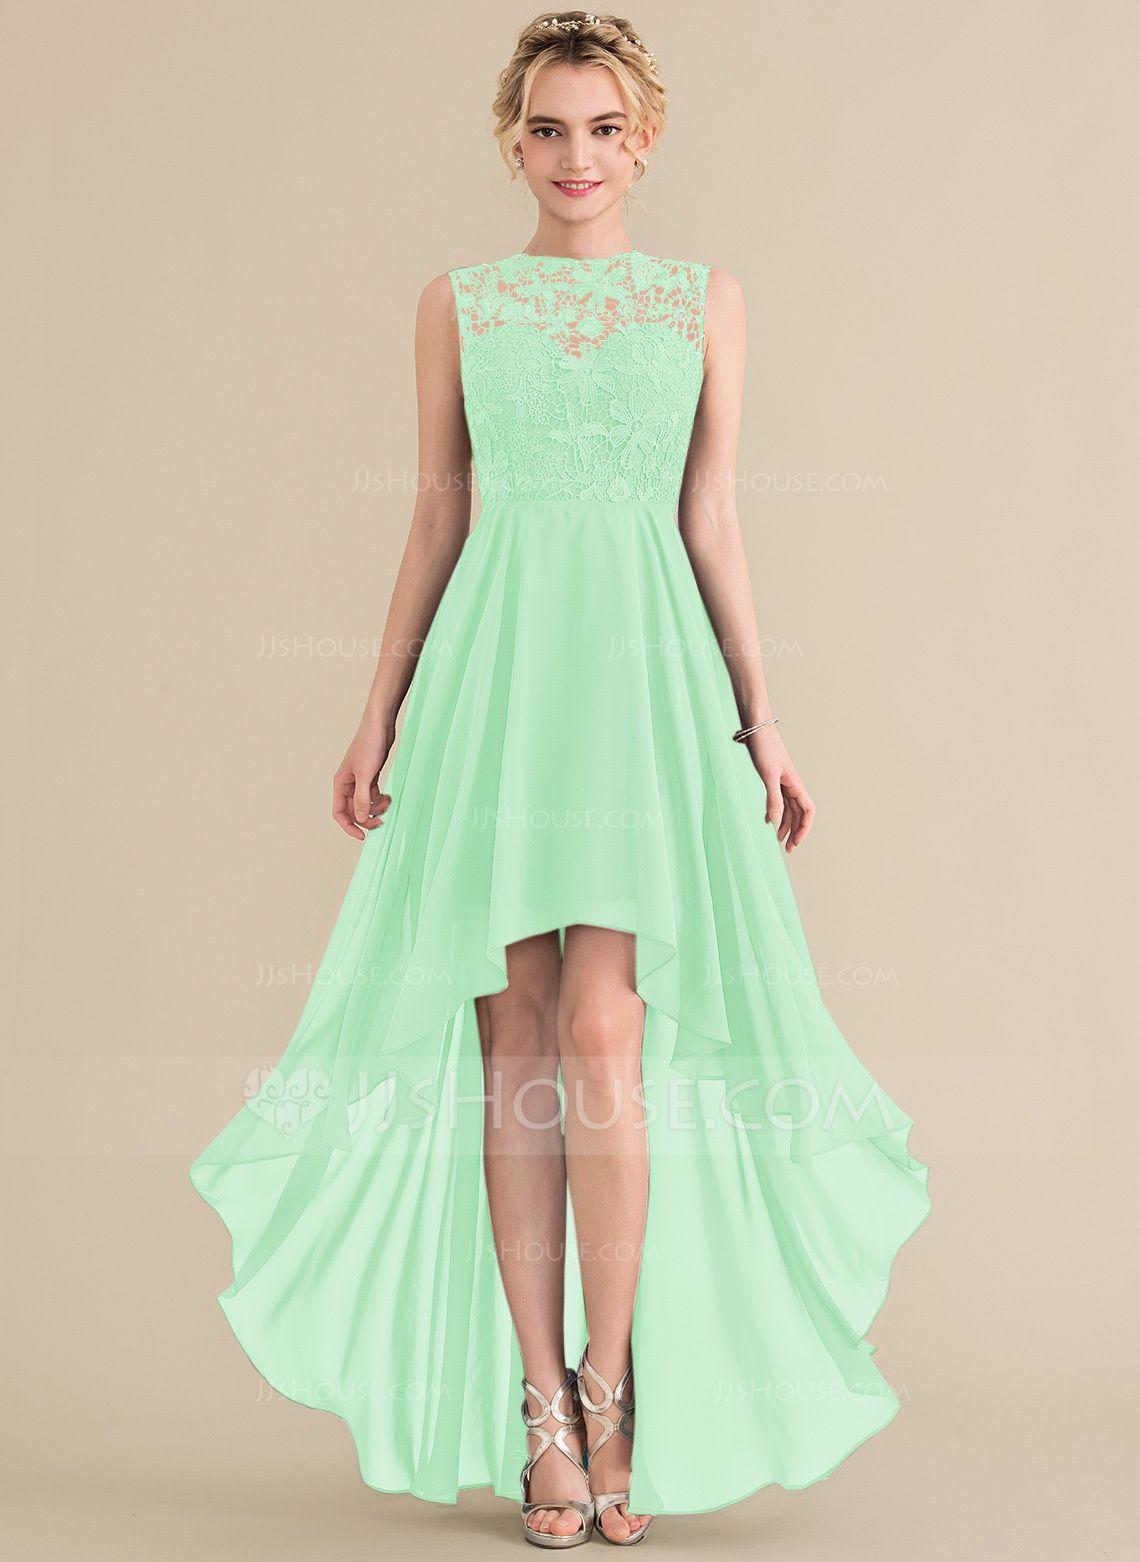 ALine/Princess Scoop Neck Asymmetrical Chiffon Lace